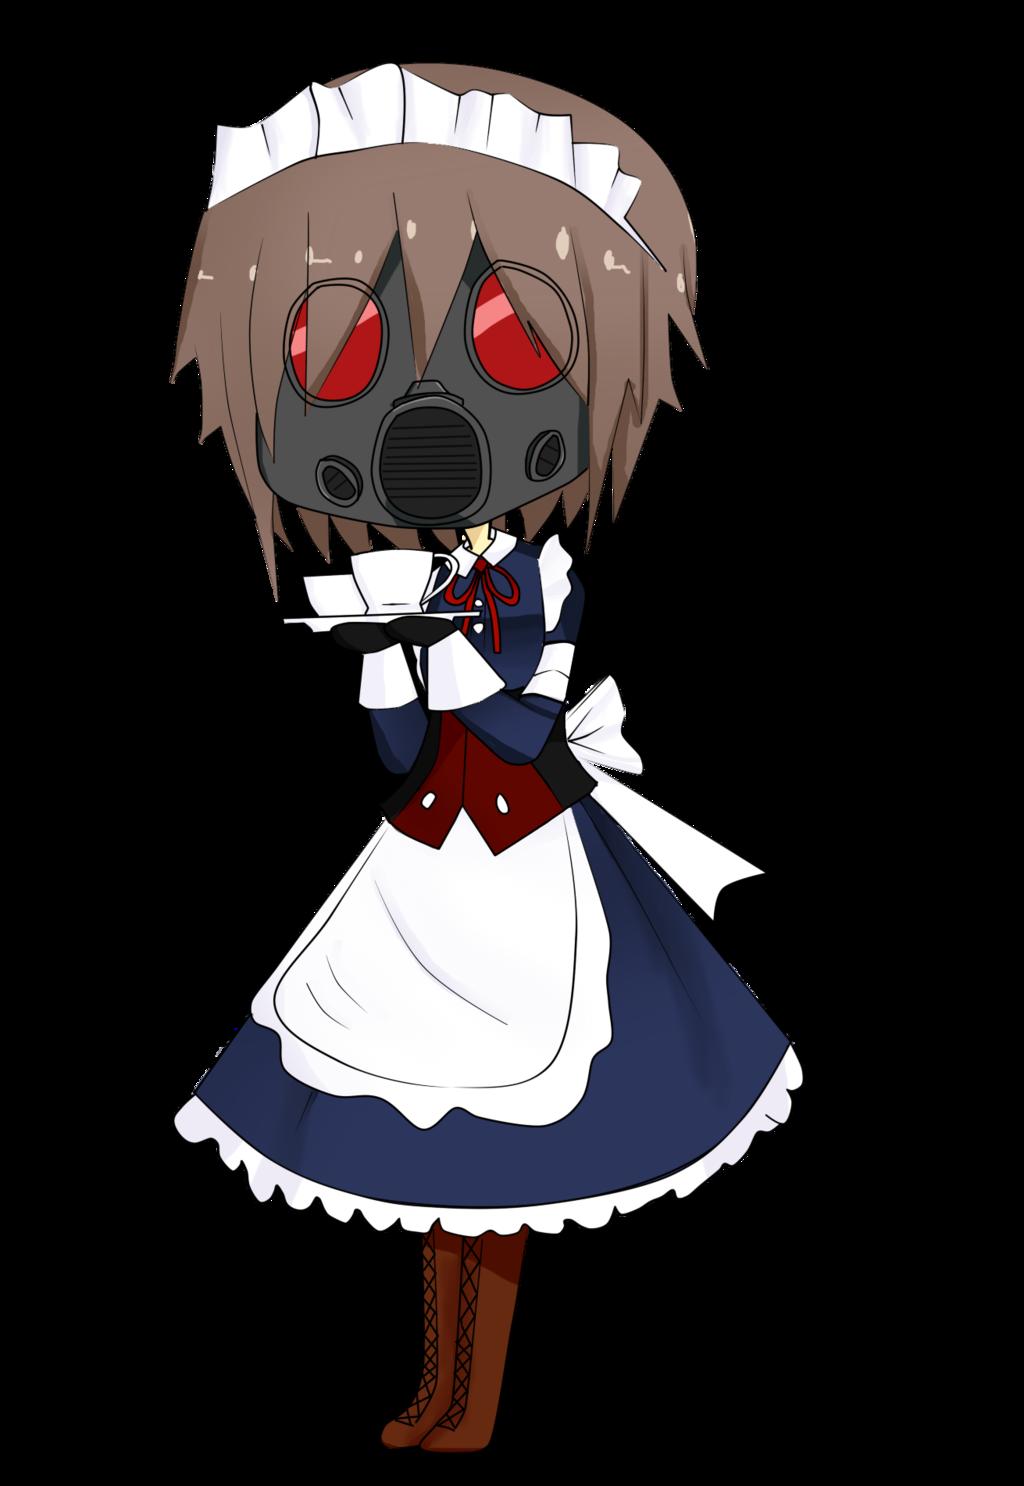 anime neko girl kawaii creepypasta Google Search cute